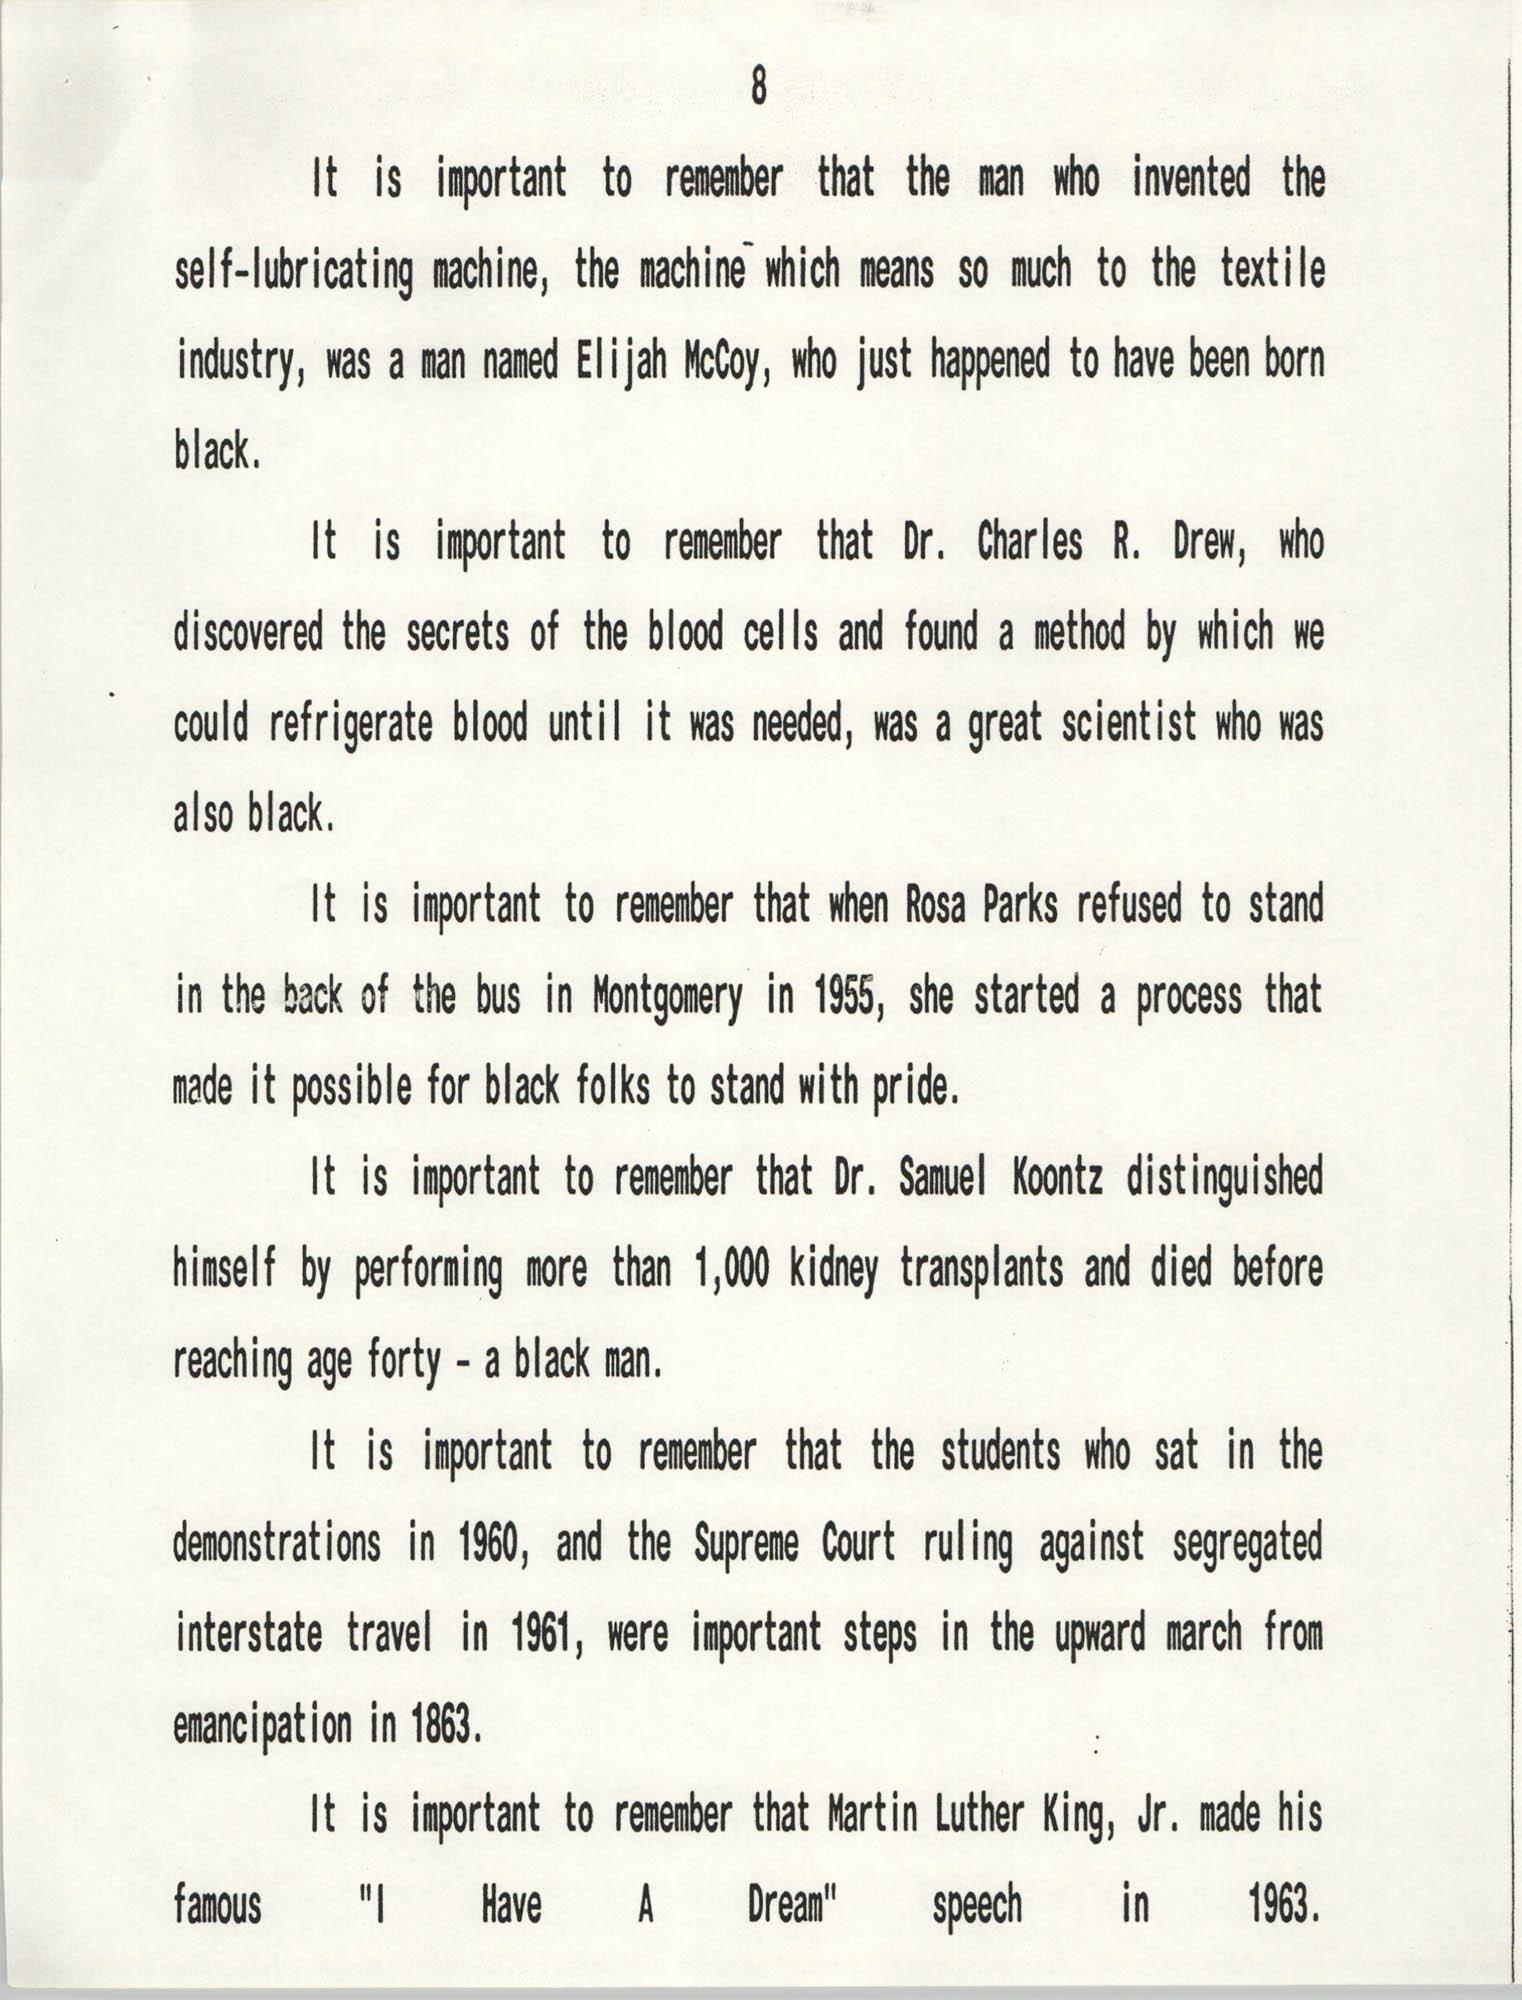 Senator Herbert U. Fielding, Black History Observance, February 28, 1988, Page 8